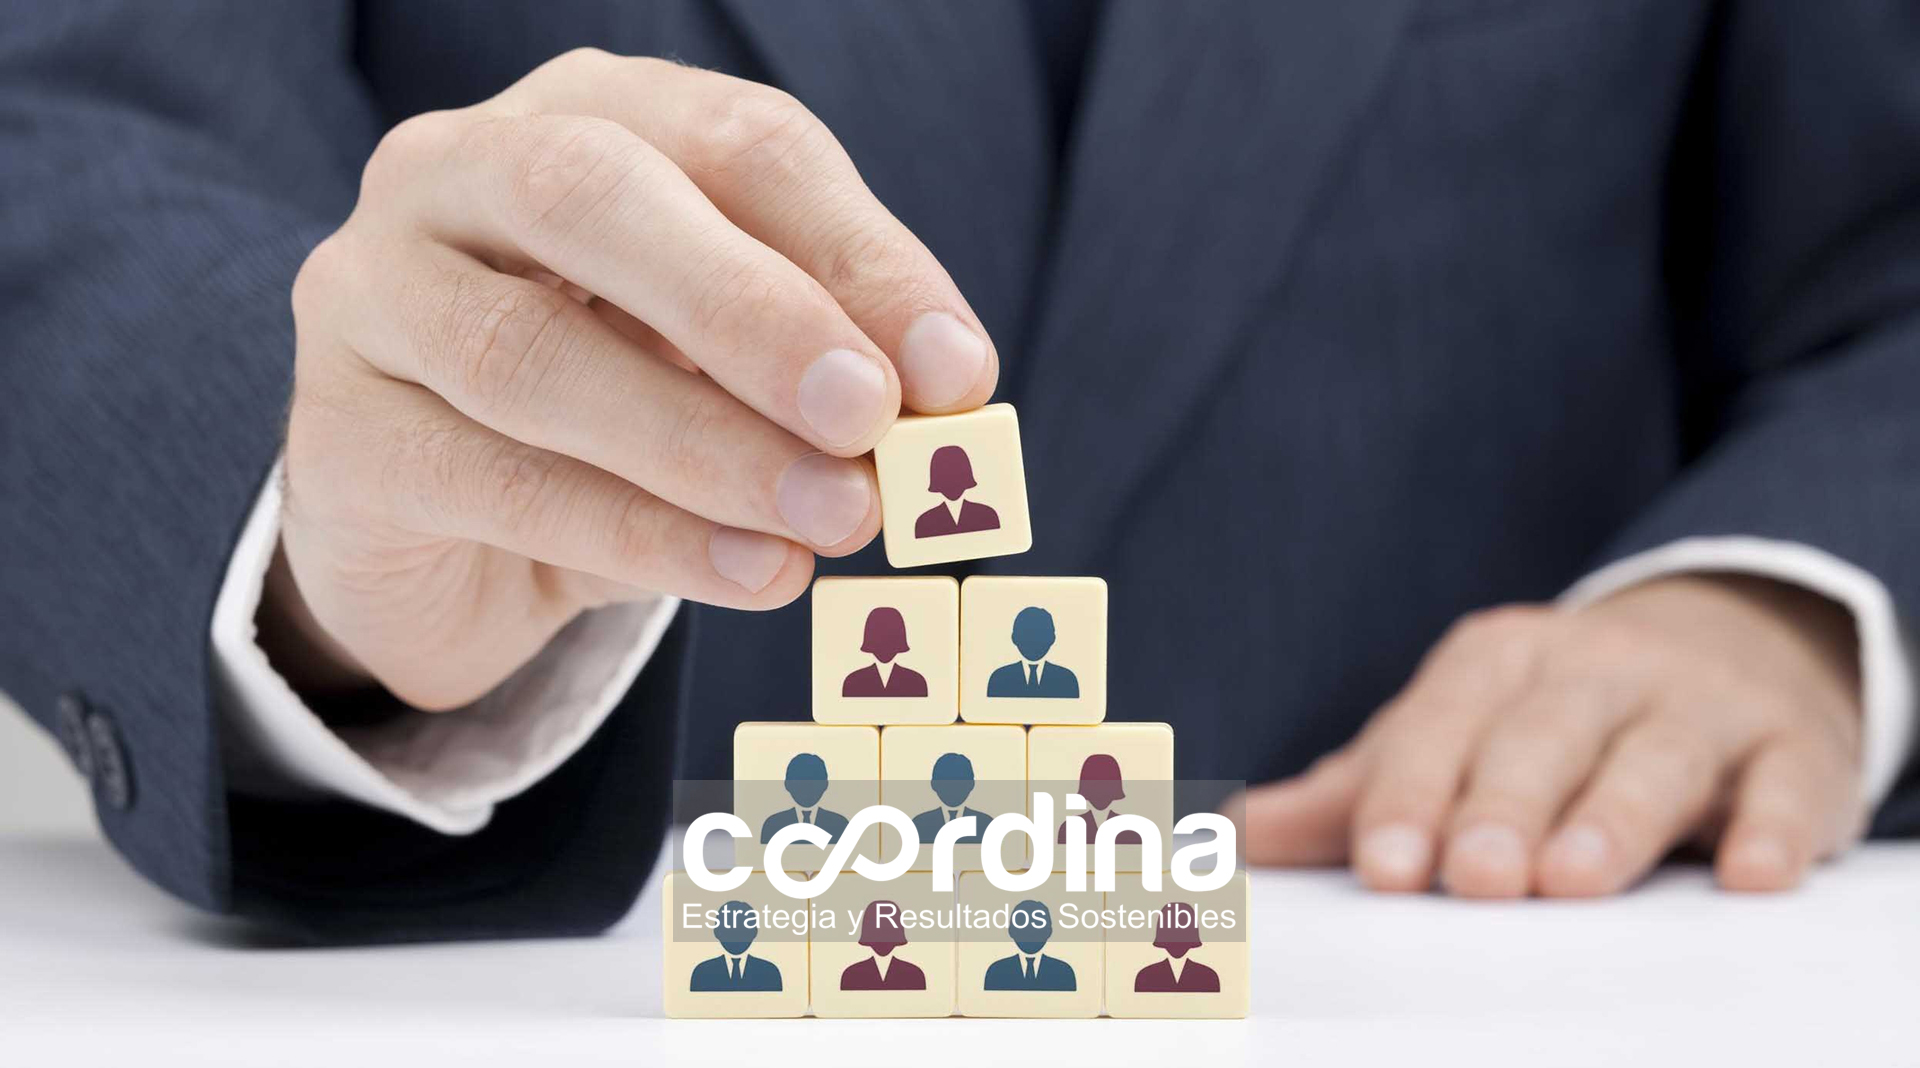 Coordina